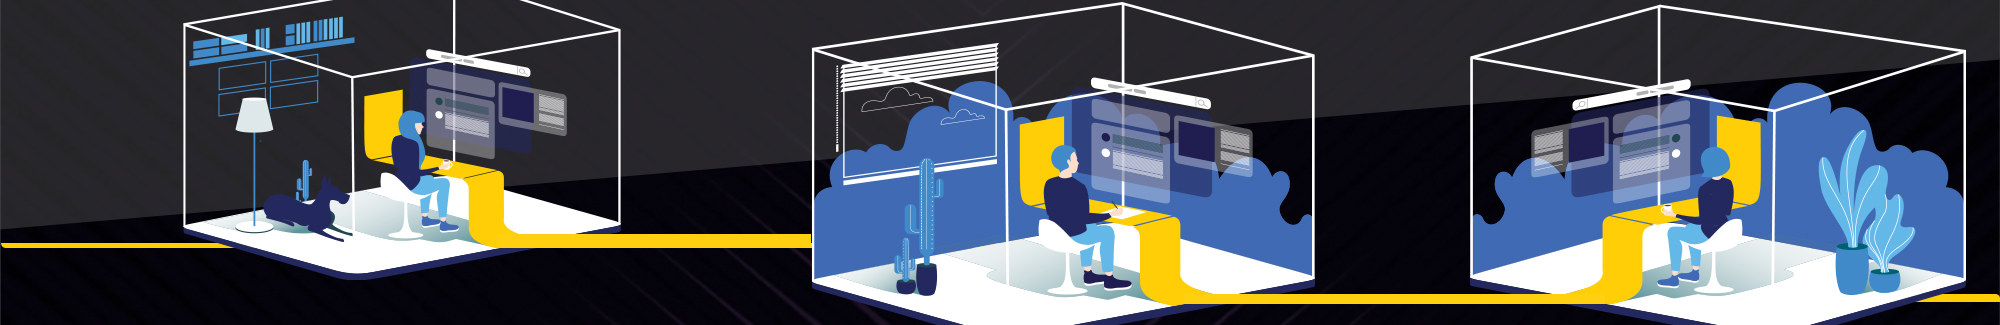 Webinar on Remote Workforce Enablement